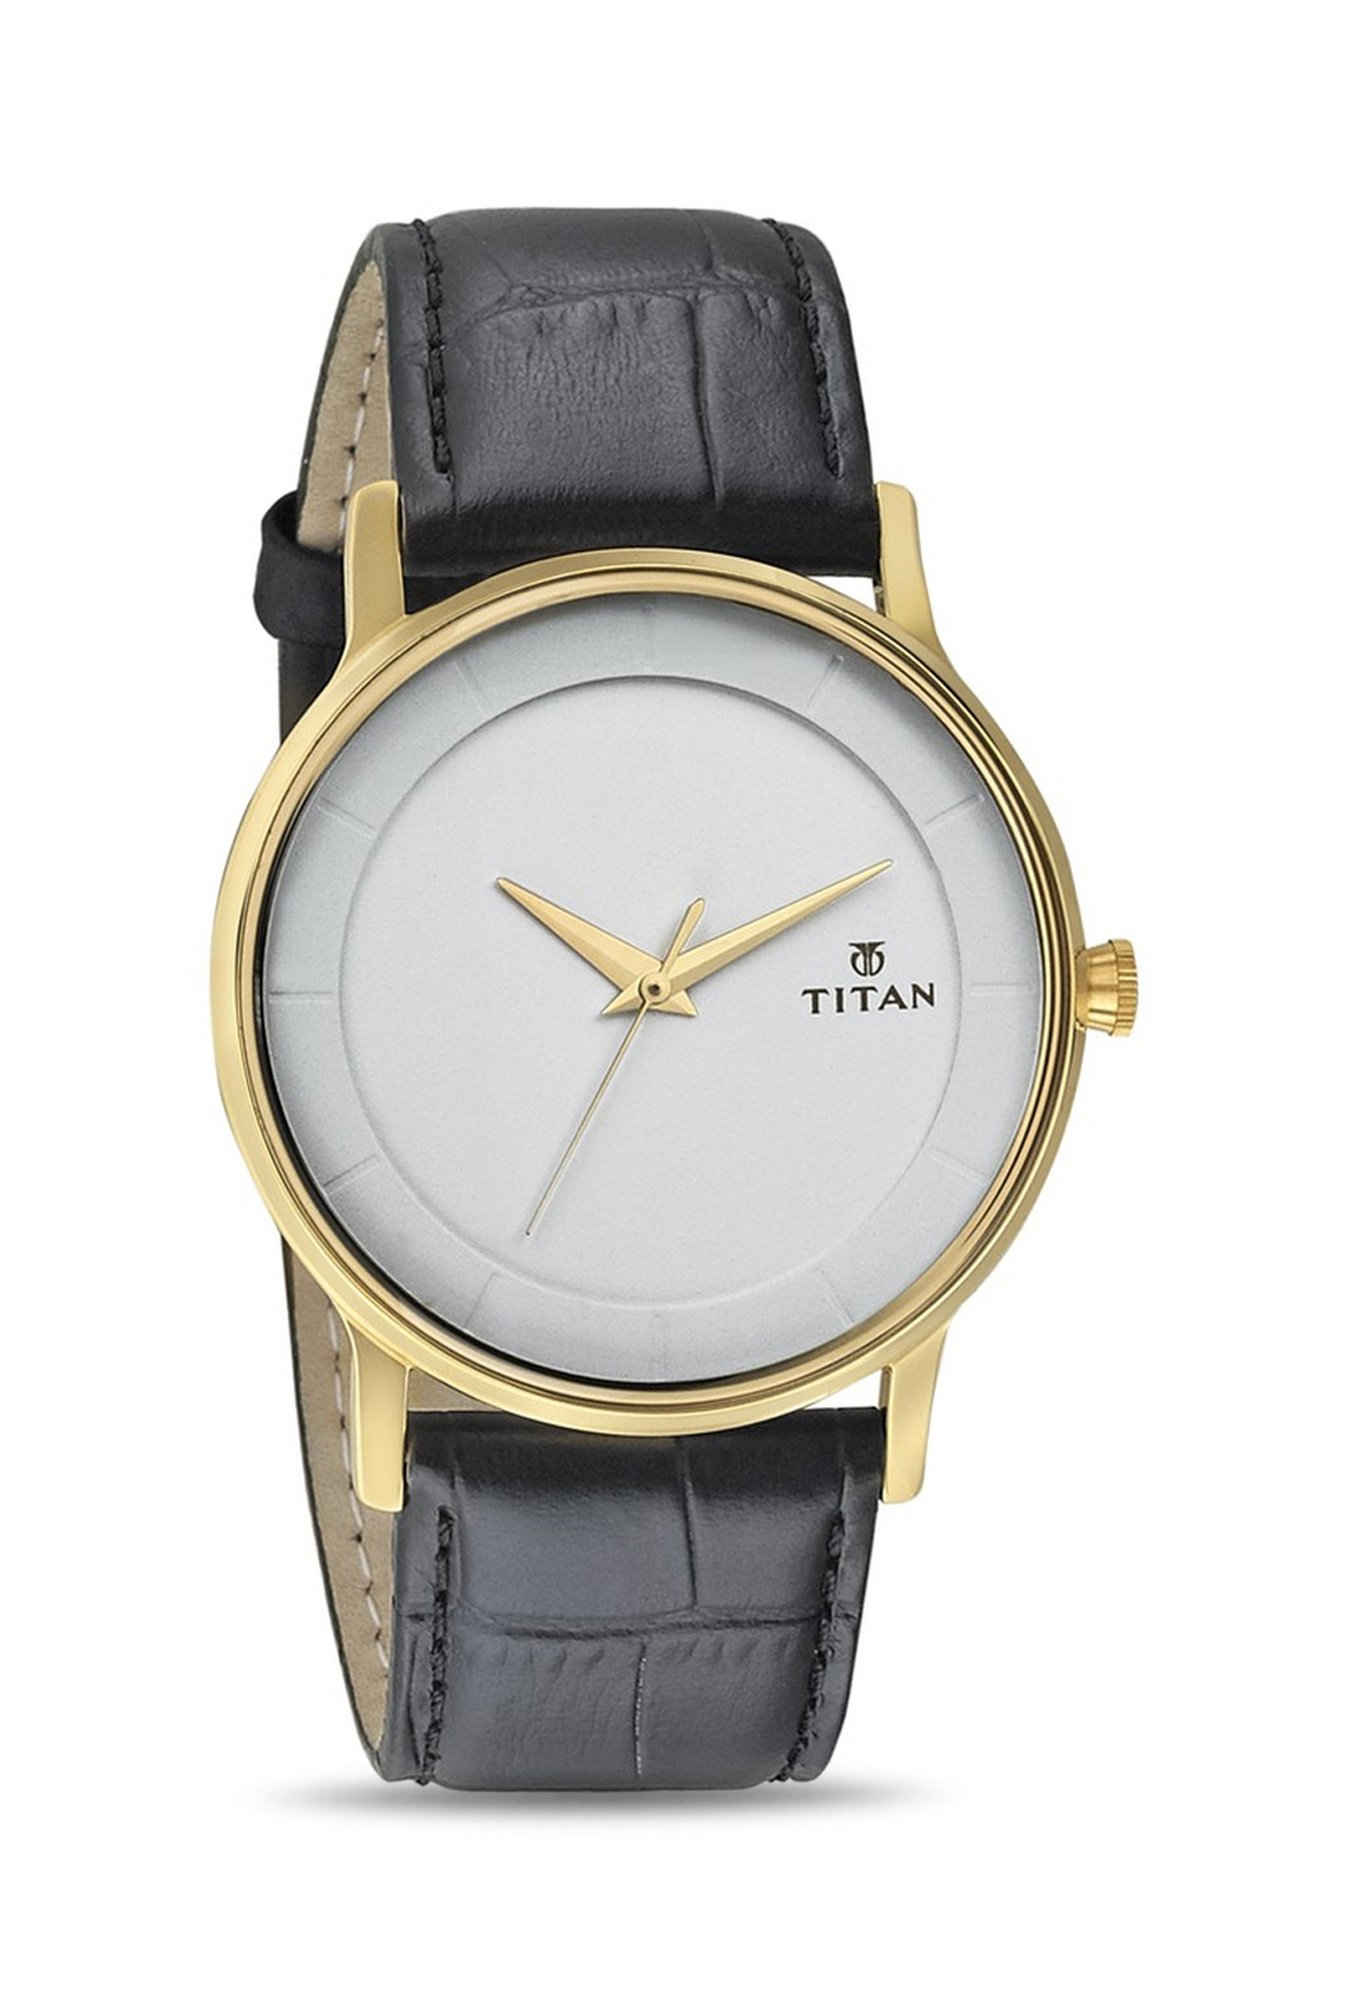 Titan Retro 1672YL01 Analog White Dial Men's Watch (1672YL01)